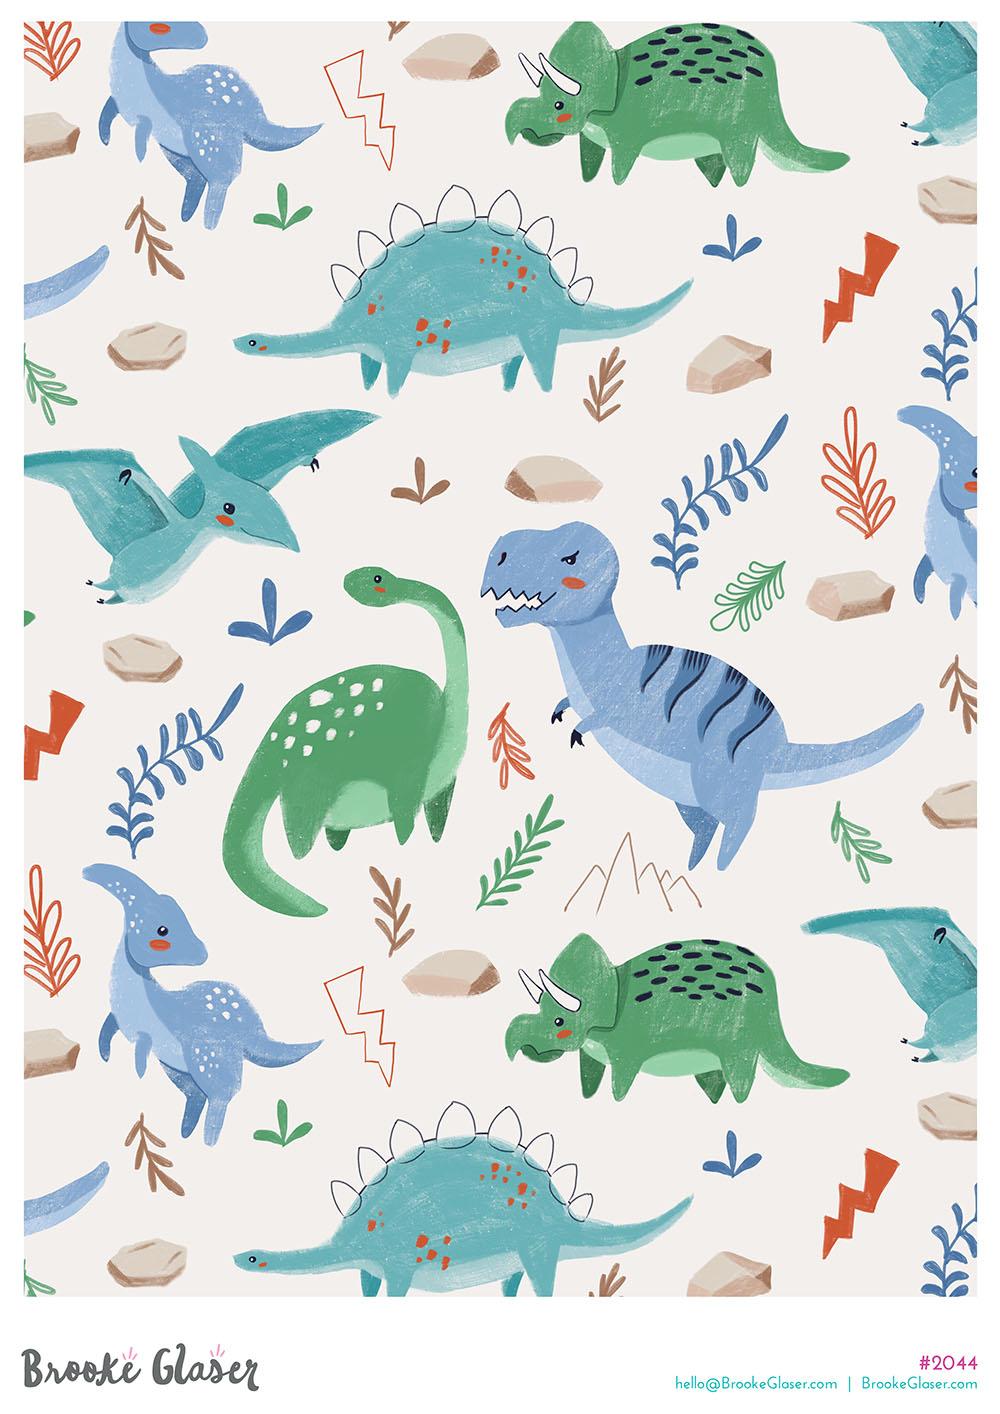 Brooke-Glaser-Dinosaur-2044.jpg